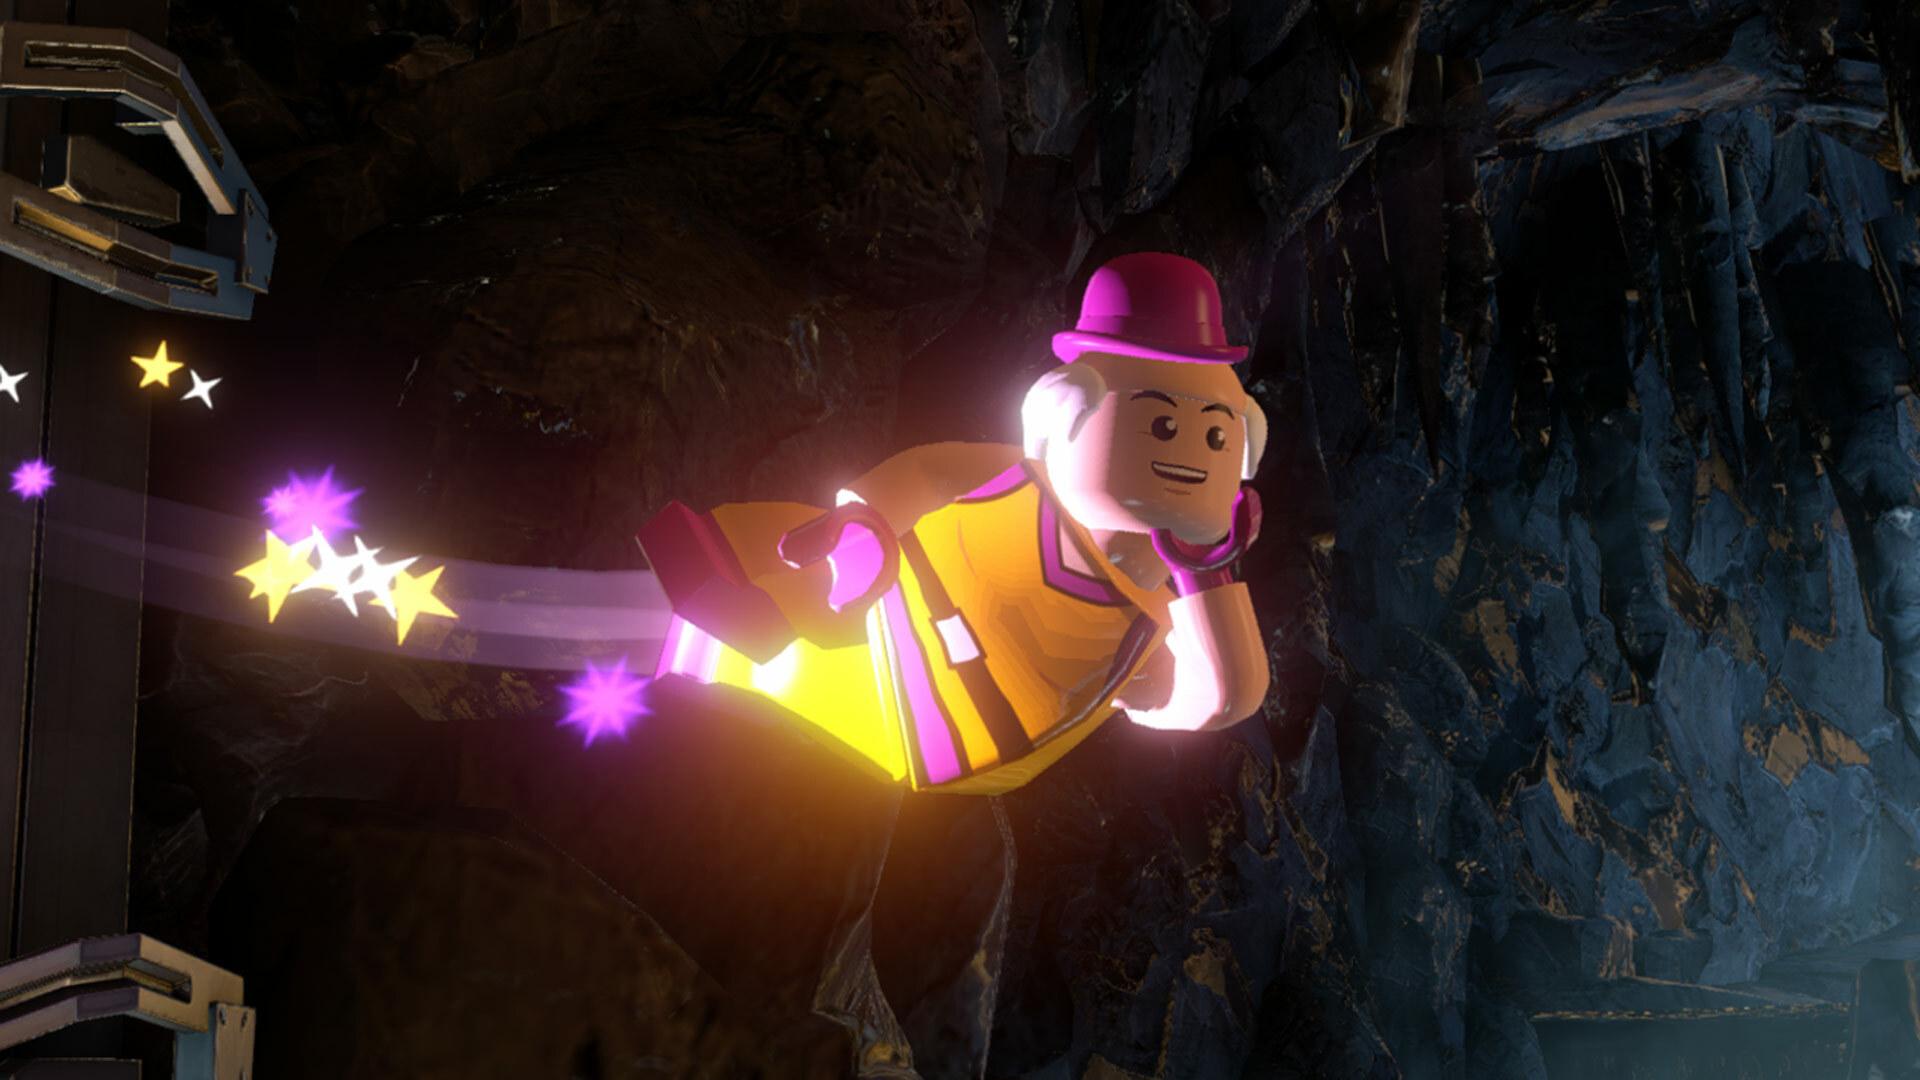 lego-batman-3-beyond-gotham-pc-screenshot-02